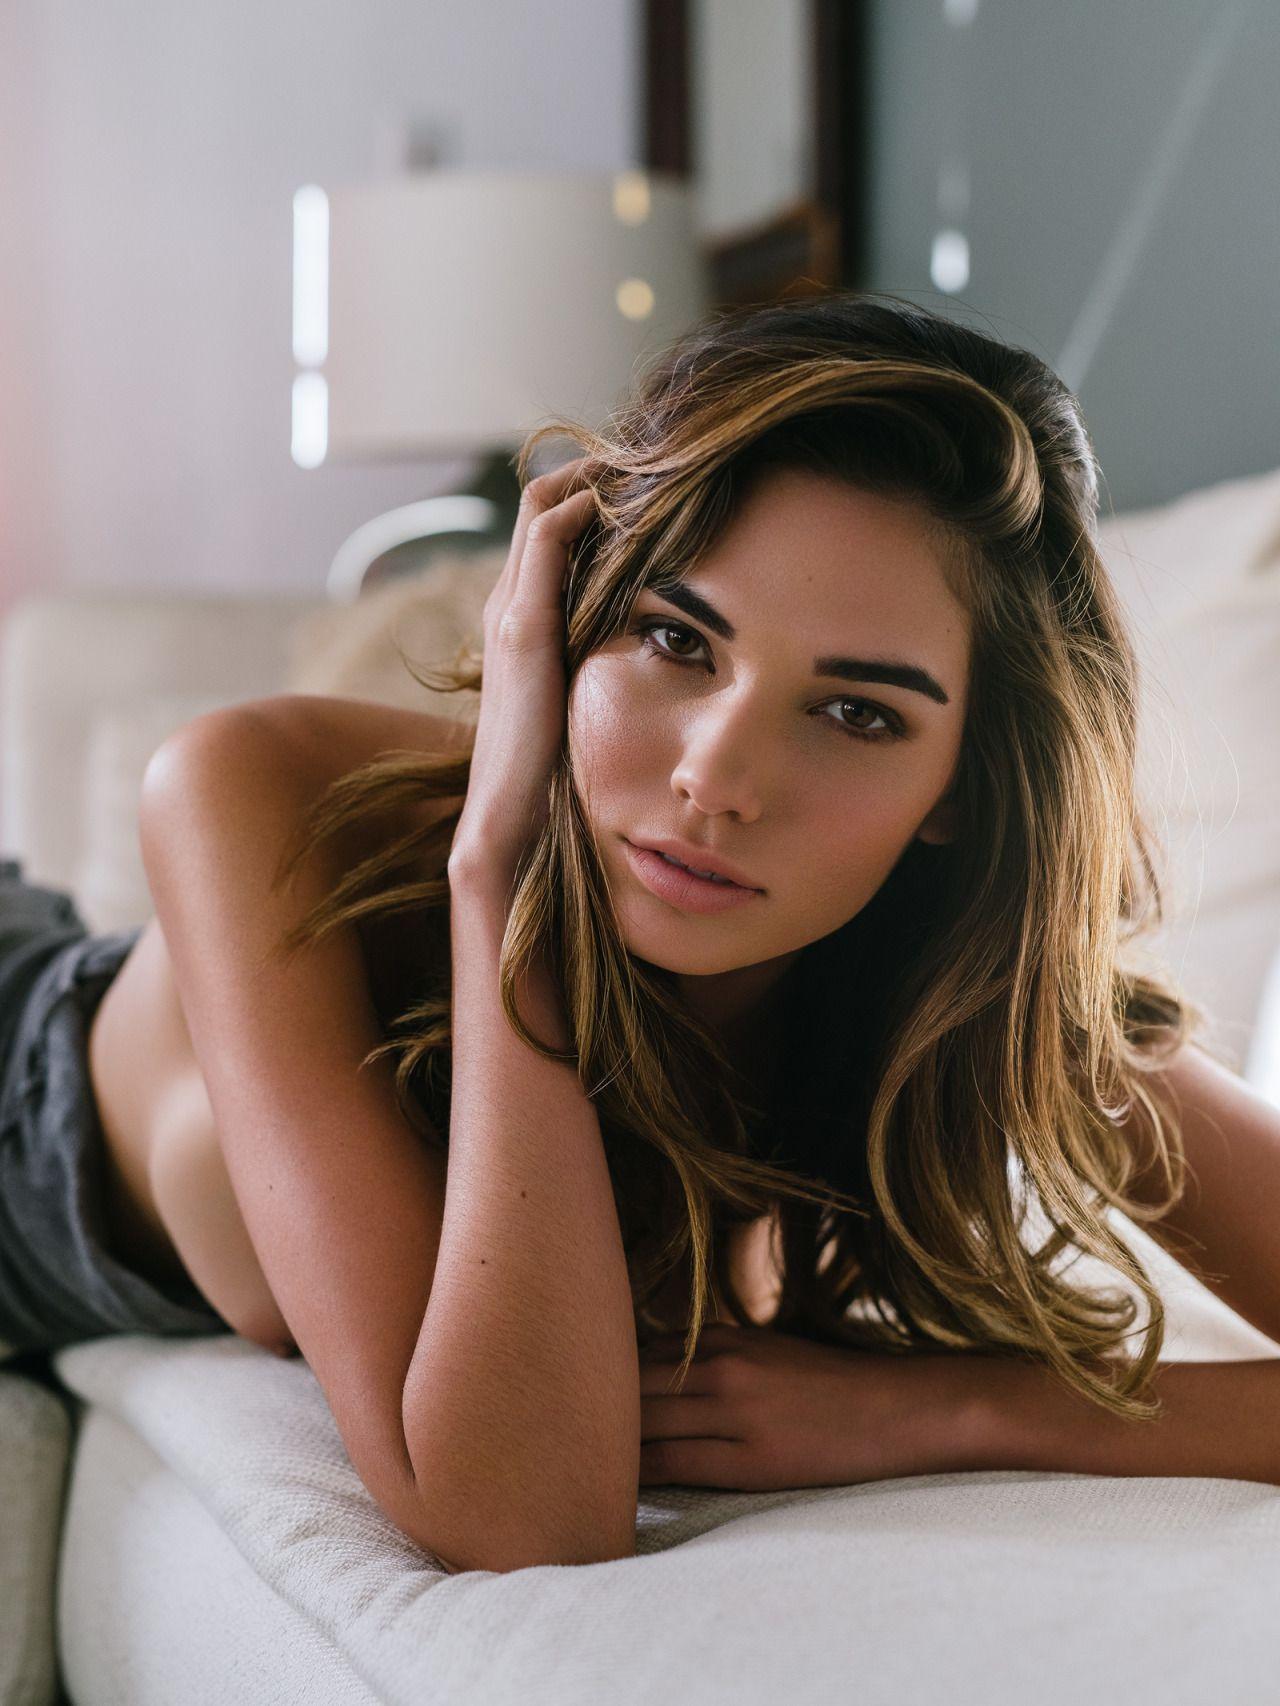 2019 Rachel Vallori naked (75 foto and video), Ass, Bikini, Selfie, lingerie 2020